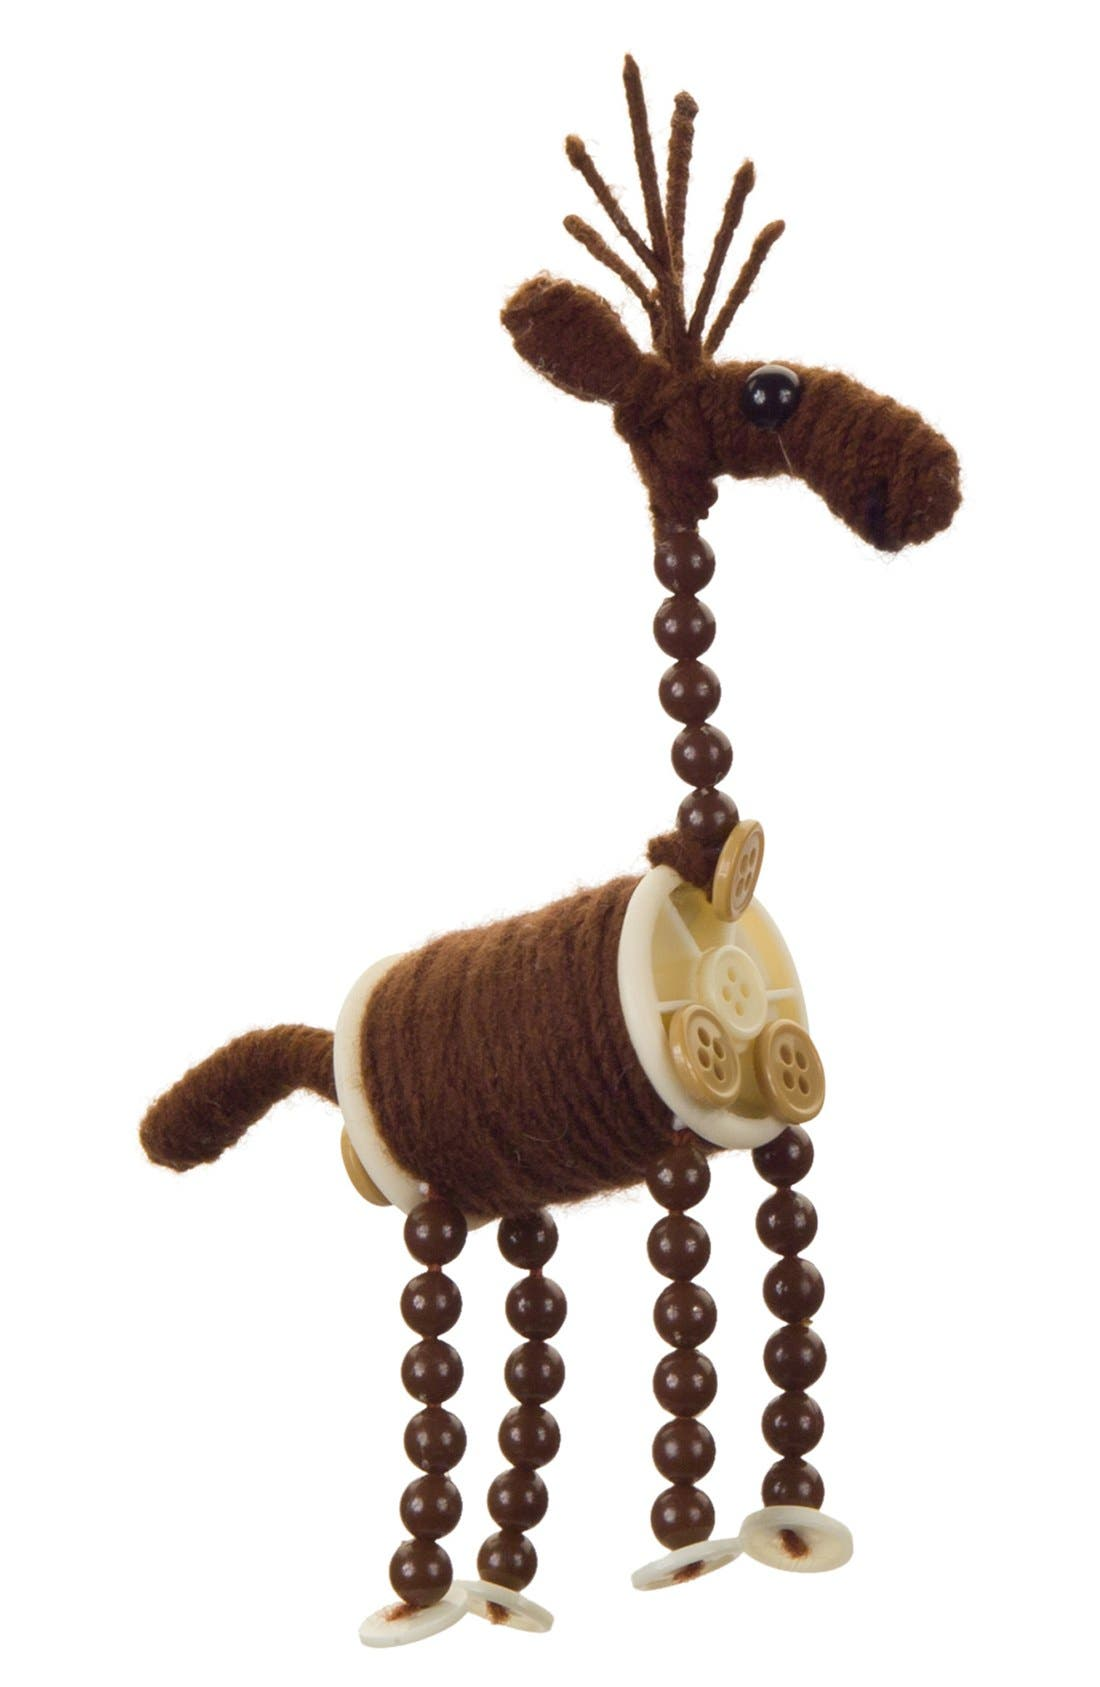 Alternate Image 1 Selected - Melrose Gifts Knitting Spool Deer Ornament